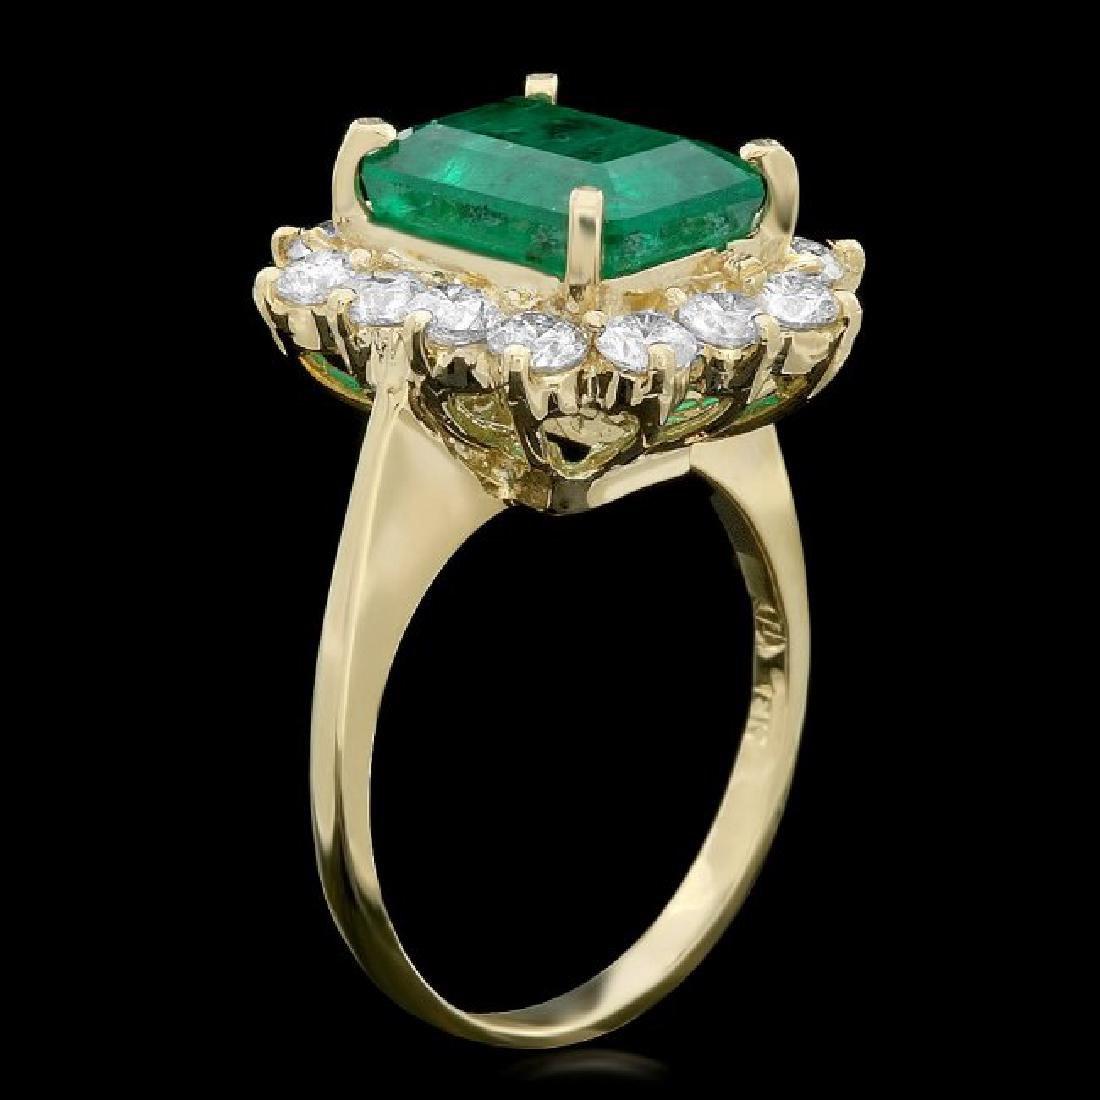 18k Gold 3.50ct Emerald 1.30ct Diamond Ring - 2